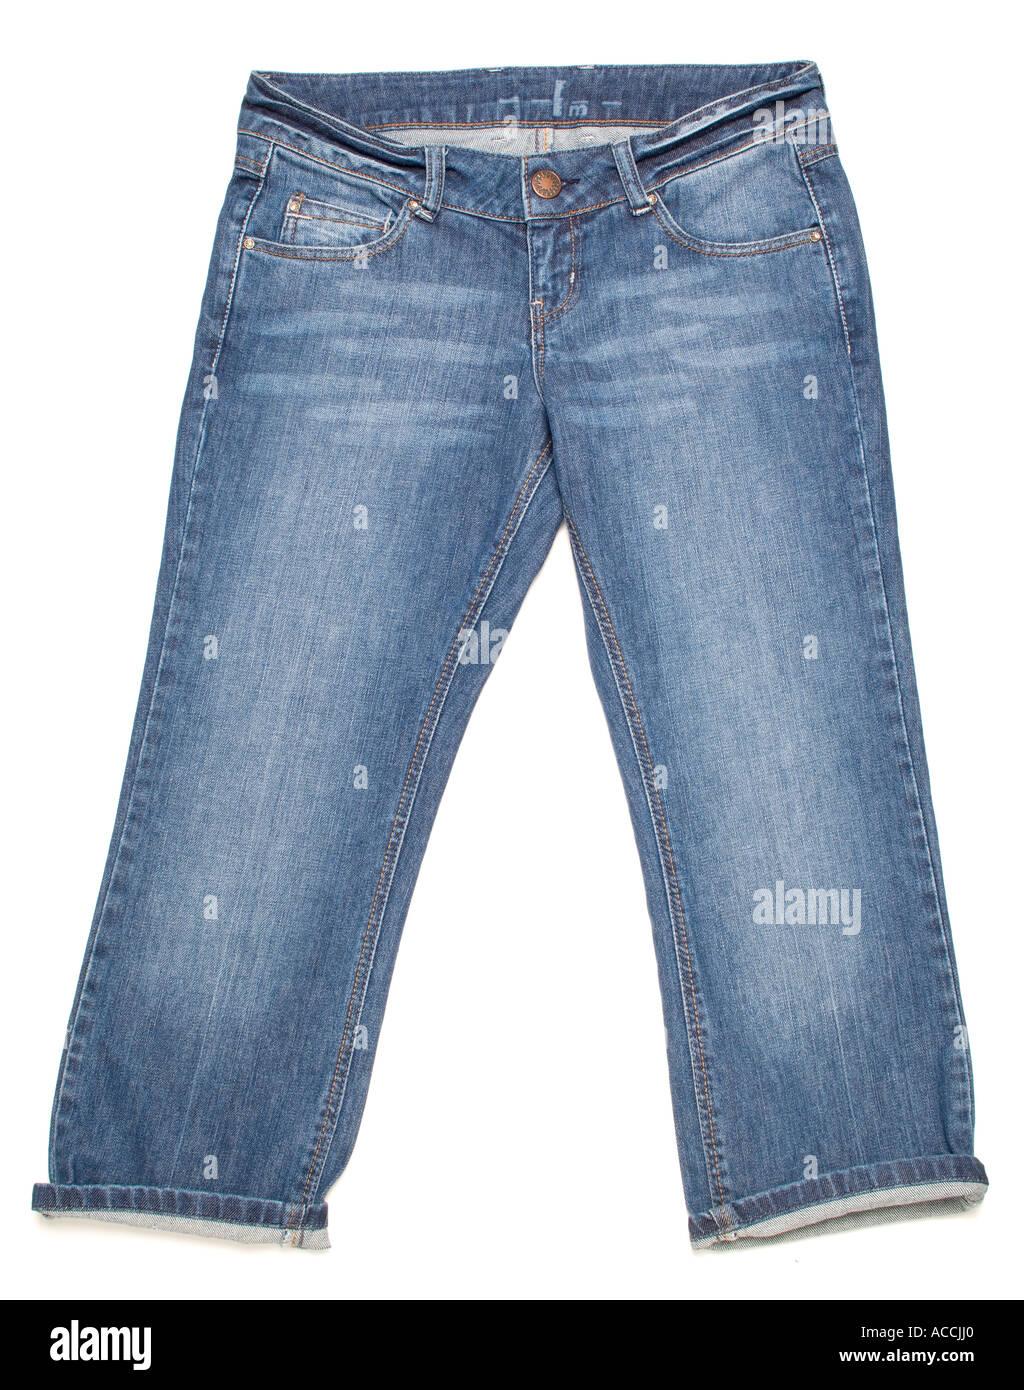 Denim jeans - Stock Image